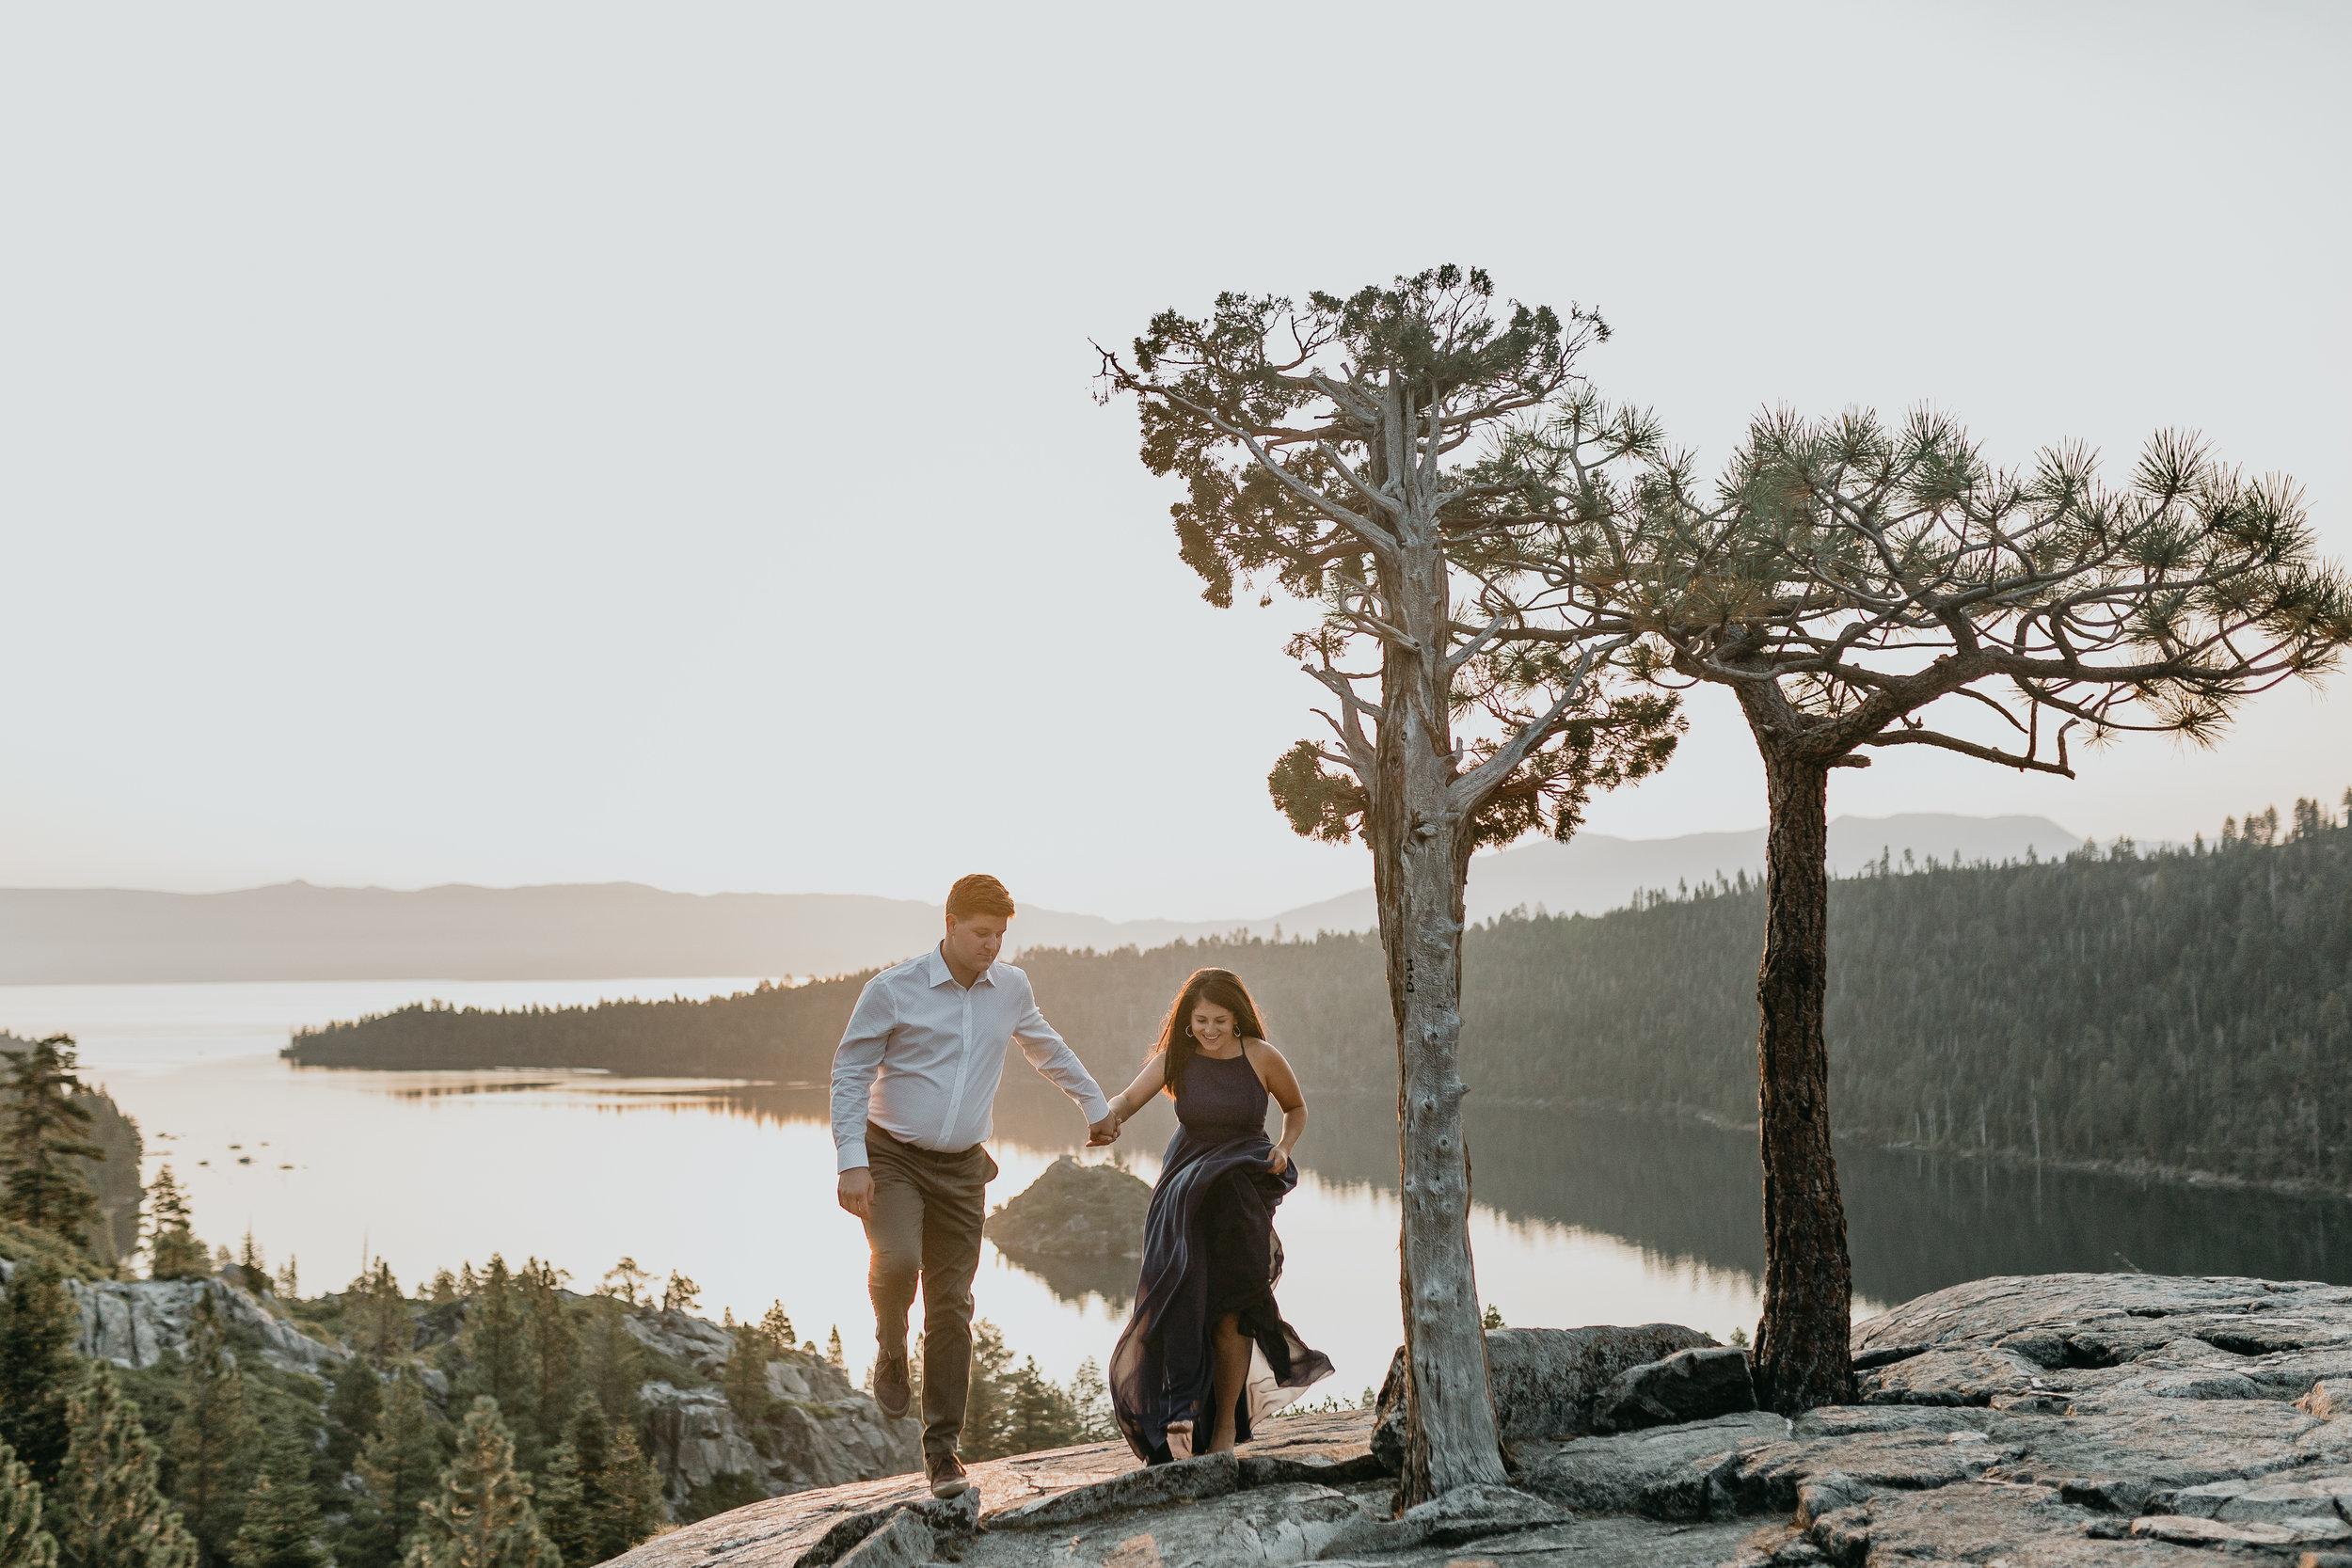 nicole-daacke-photography-lake-tahoe-sunrise-summer-adventure-engagement-photos-nevada-wedding-elopement-photographer-golden-emerald-bay-light-pine-trees-summer-vibe-fun-carefree-authentic-love-23.jpg